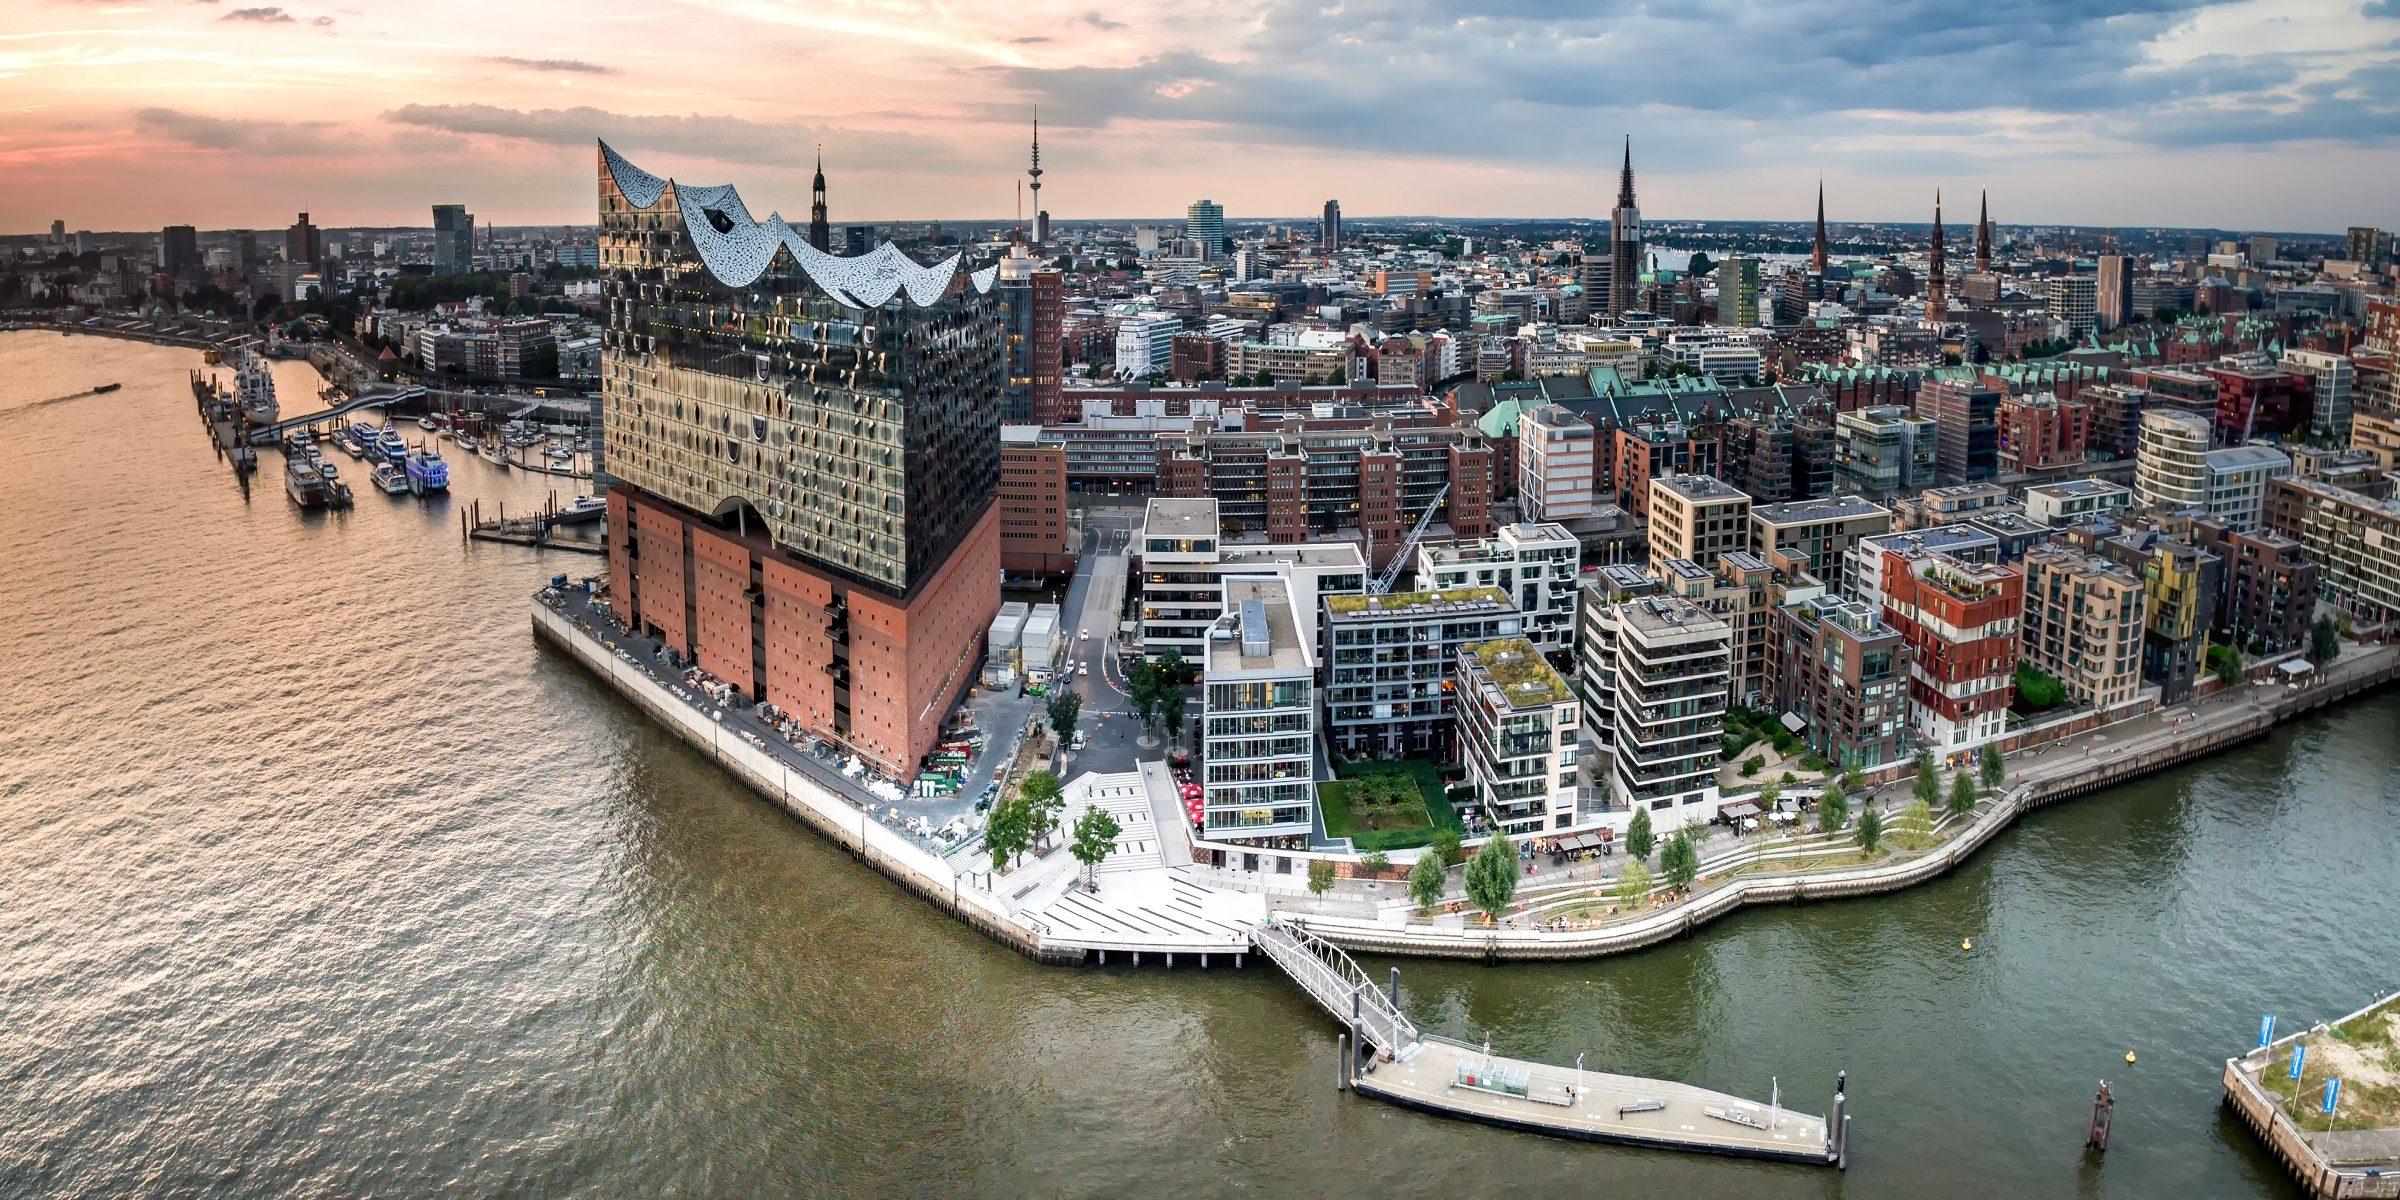 Panorama über Hamburg mit Elbphilharmonie